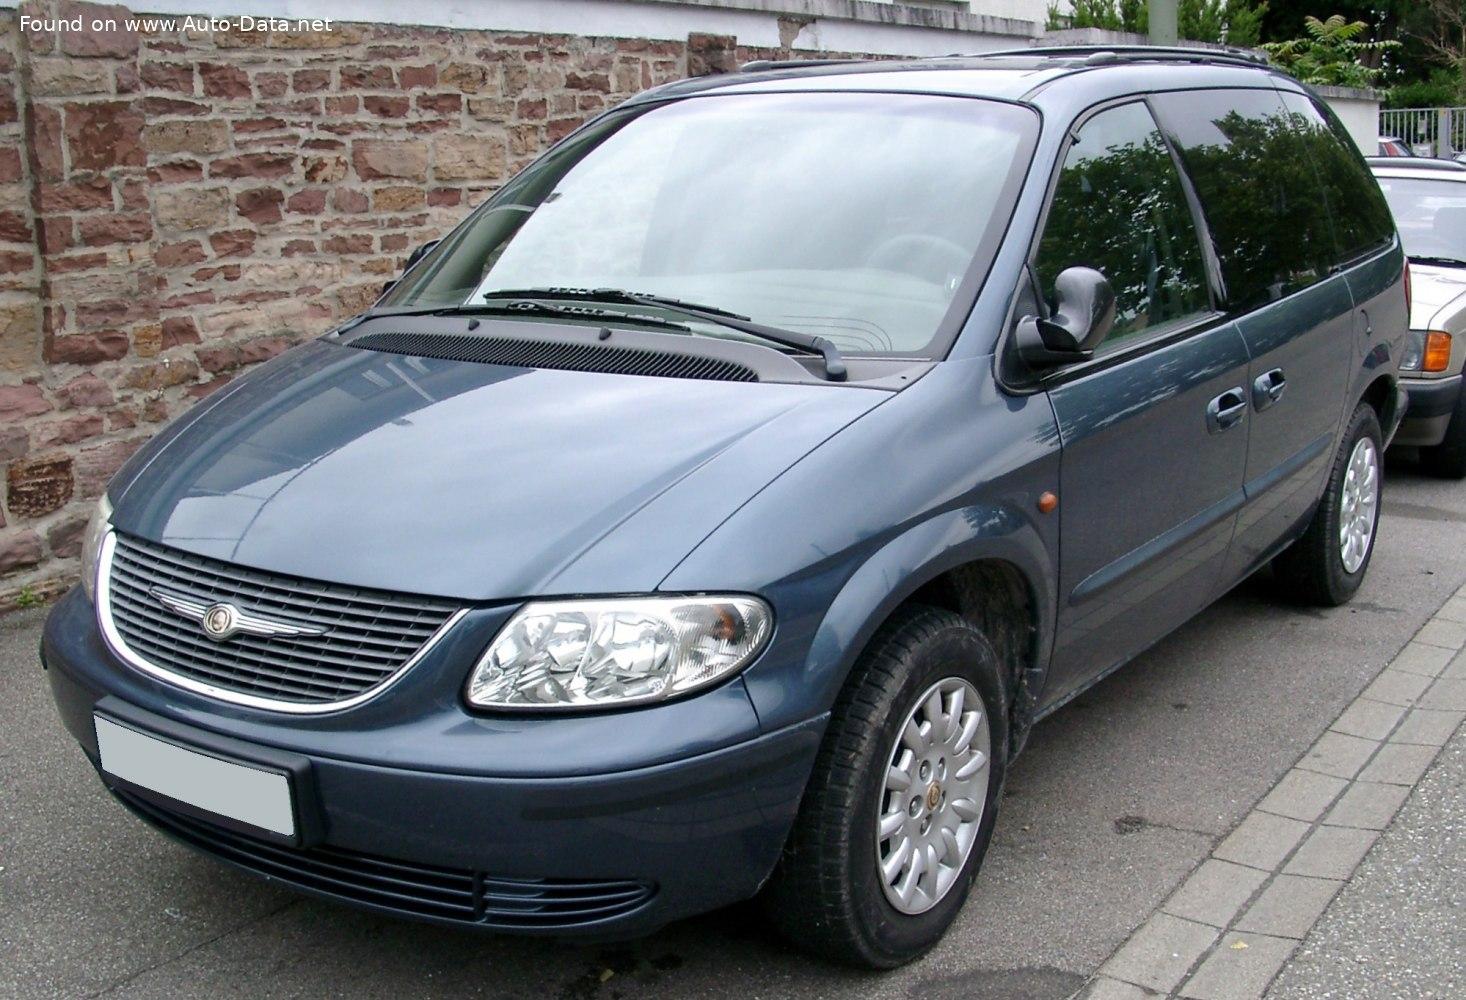 2001 Chrysler Voyager Iv 3 3 I V6 174 Cv Automatic Ficha Técnica Y Consumo Medidas